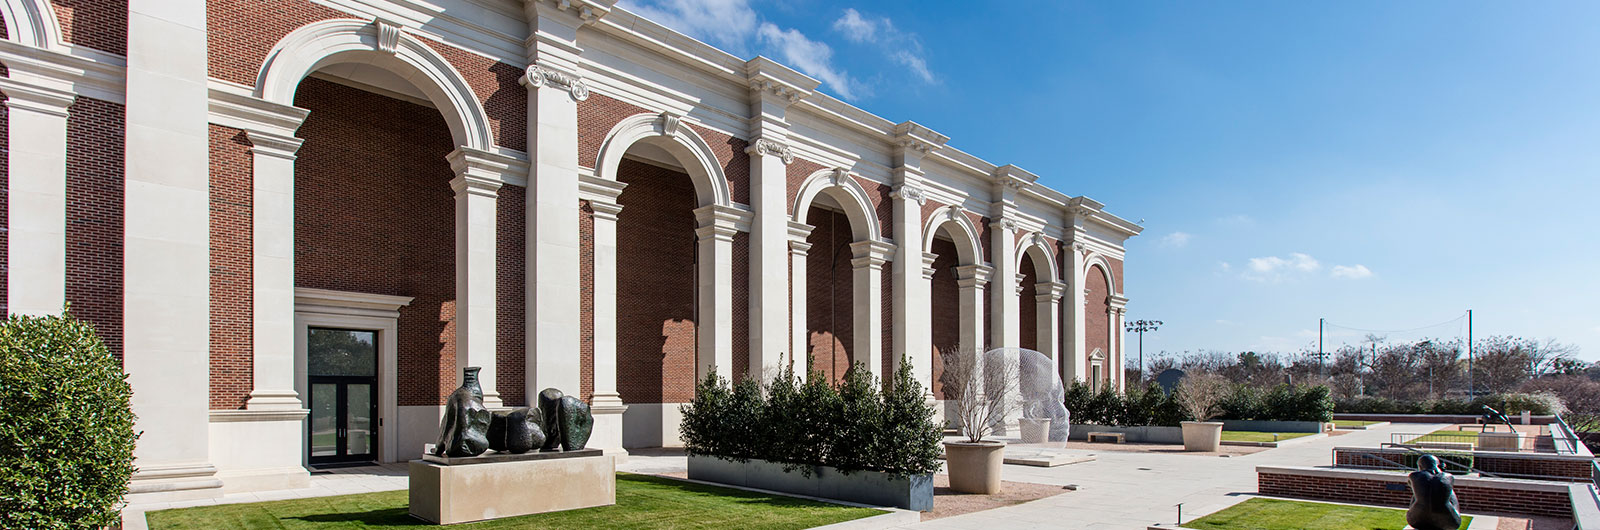 The Elizabeth Meadows Sculpture Collection - Founding Collection